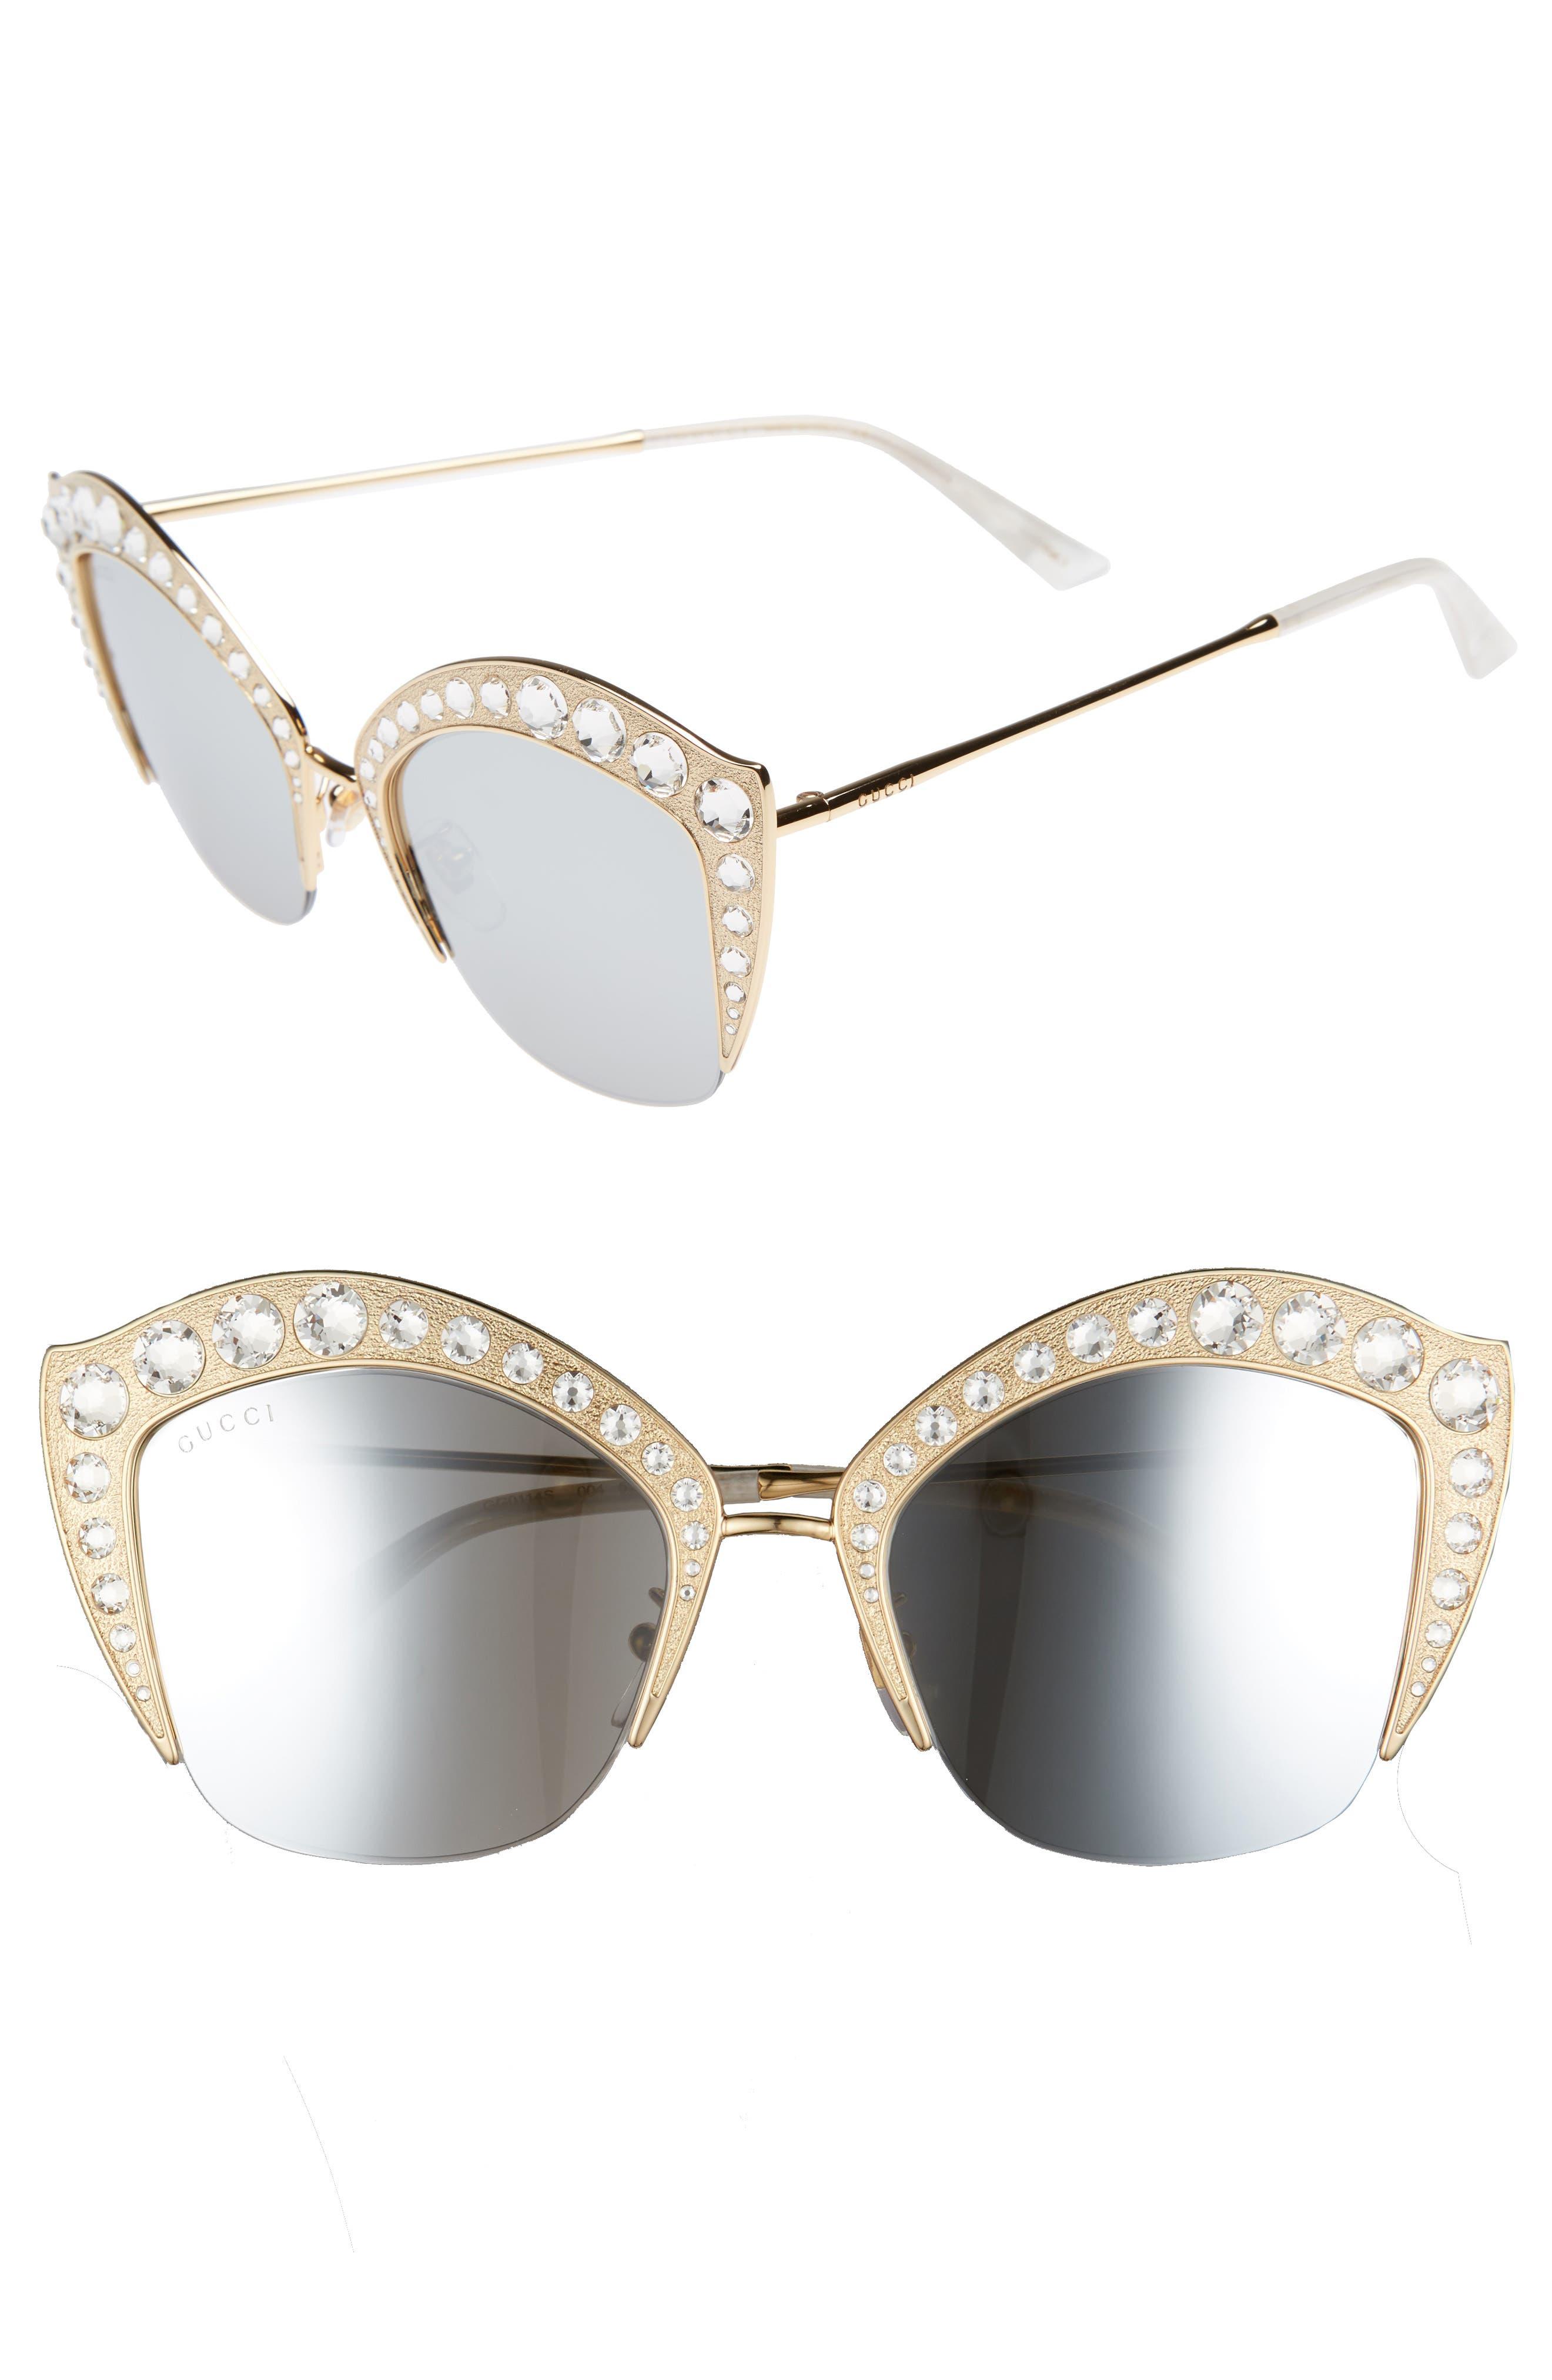 53mm Embellished Cat Eye Sunglasses,                             Main thumbnail 2, color,